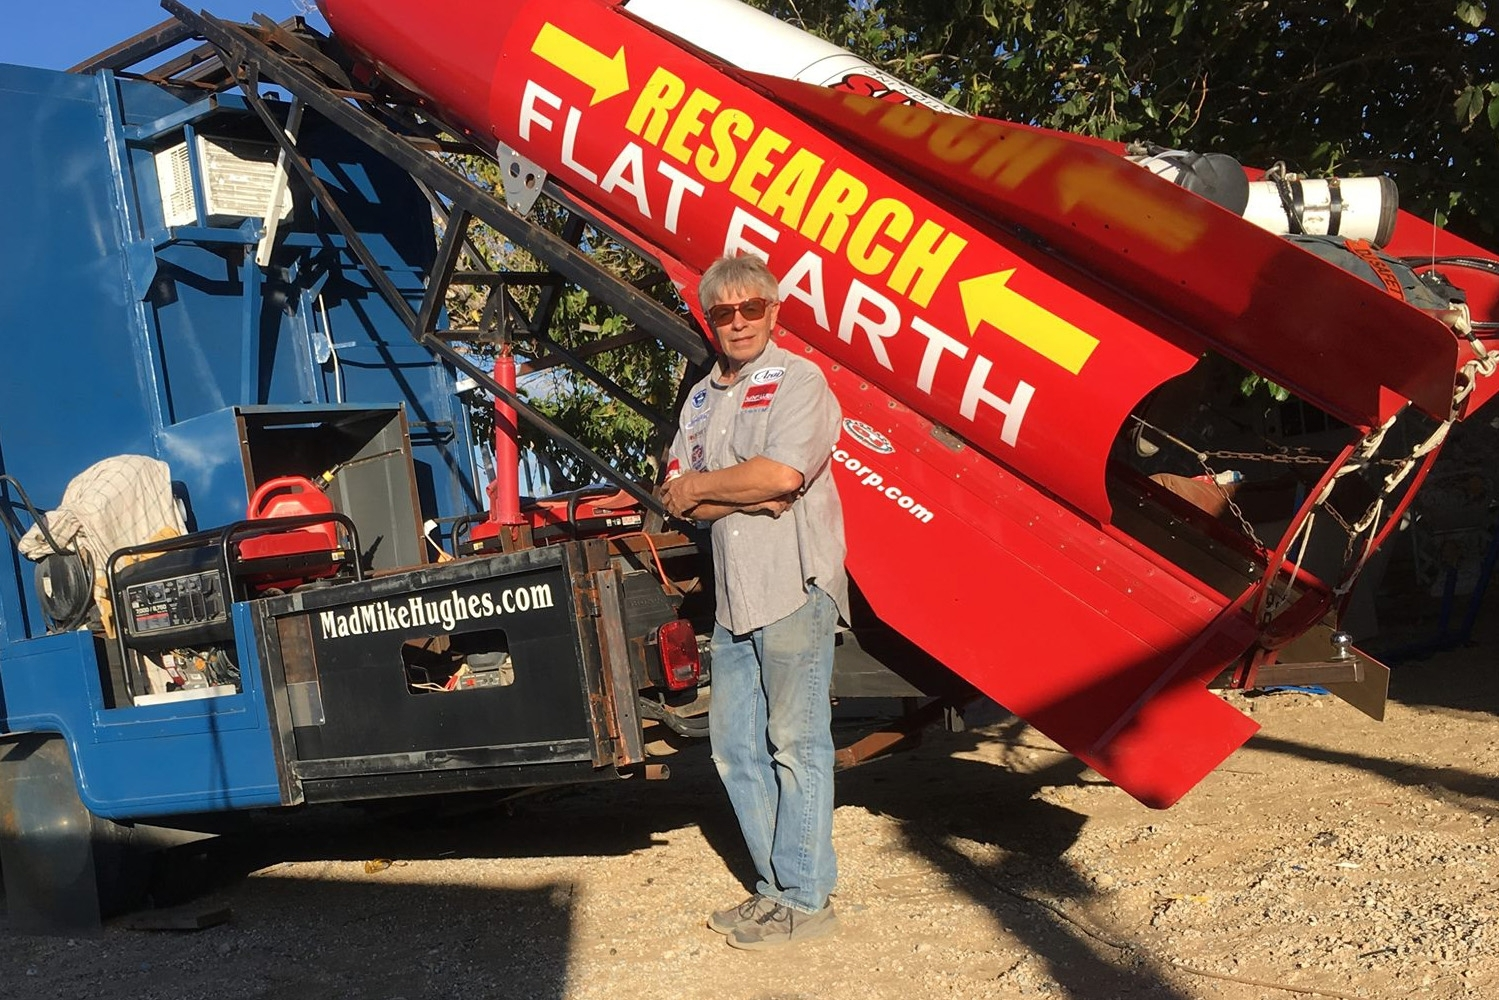 Mad Mike Hughes Flat Earth Rocket